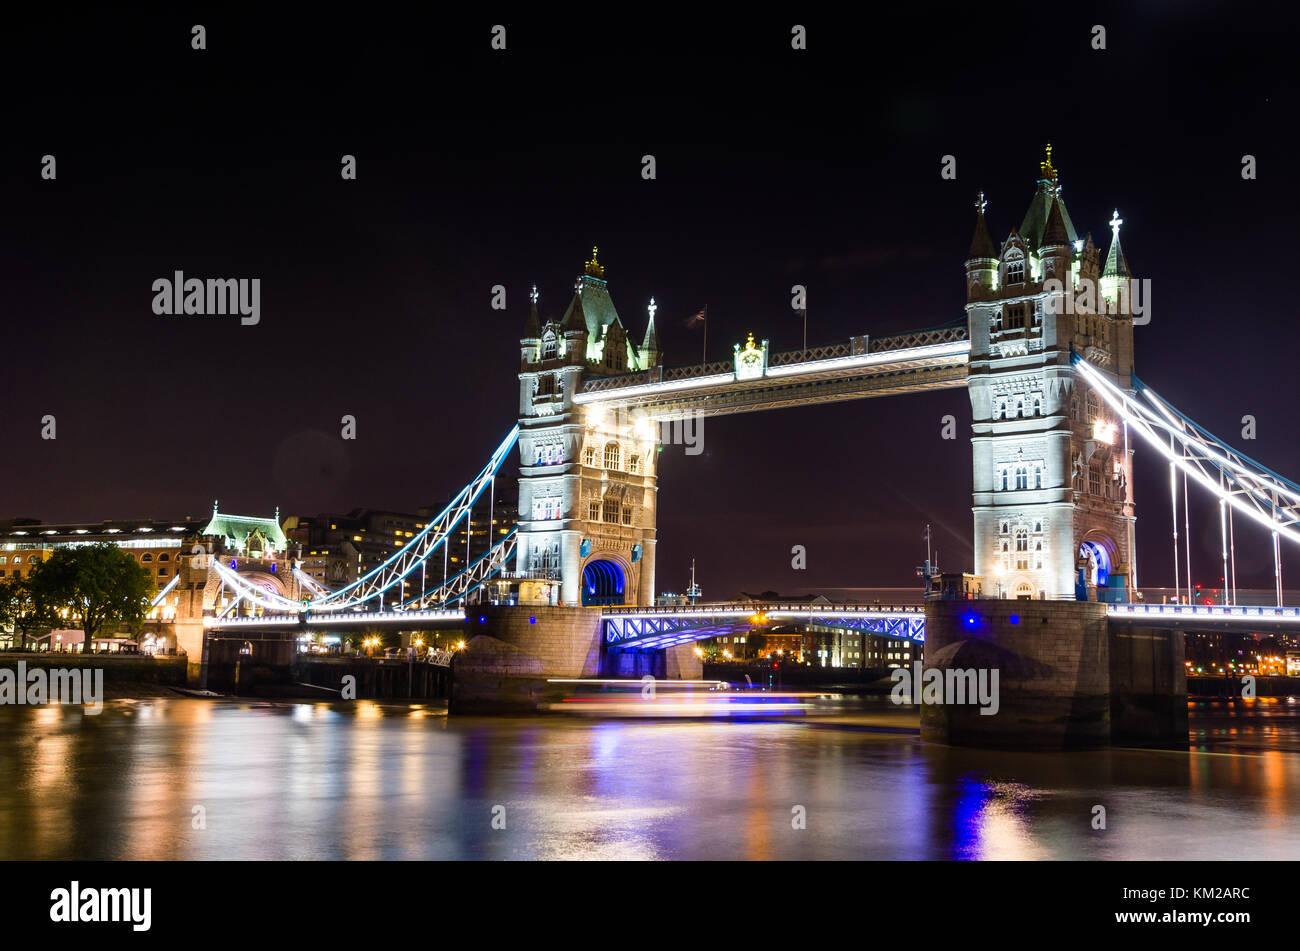 Night view of london tower bridge - Stock Image